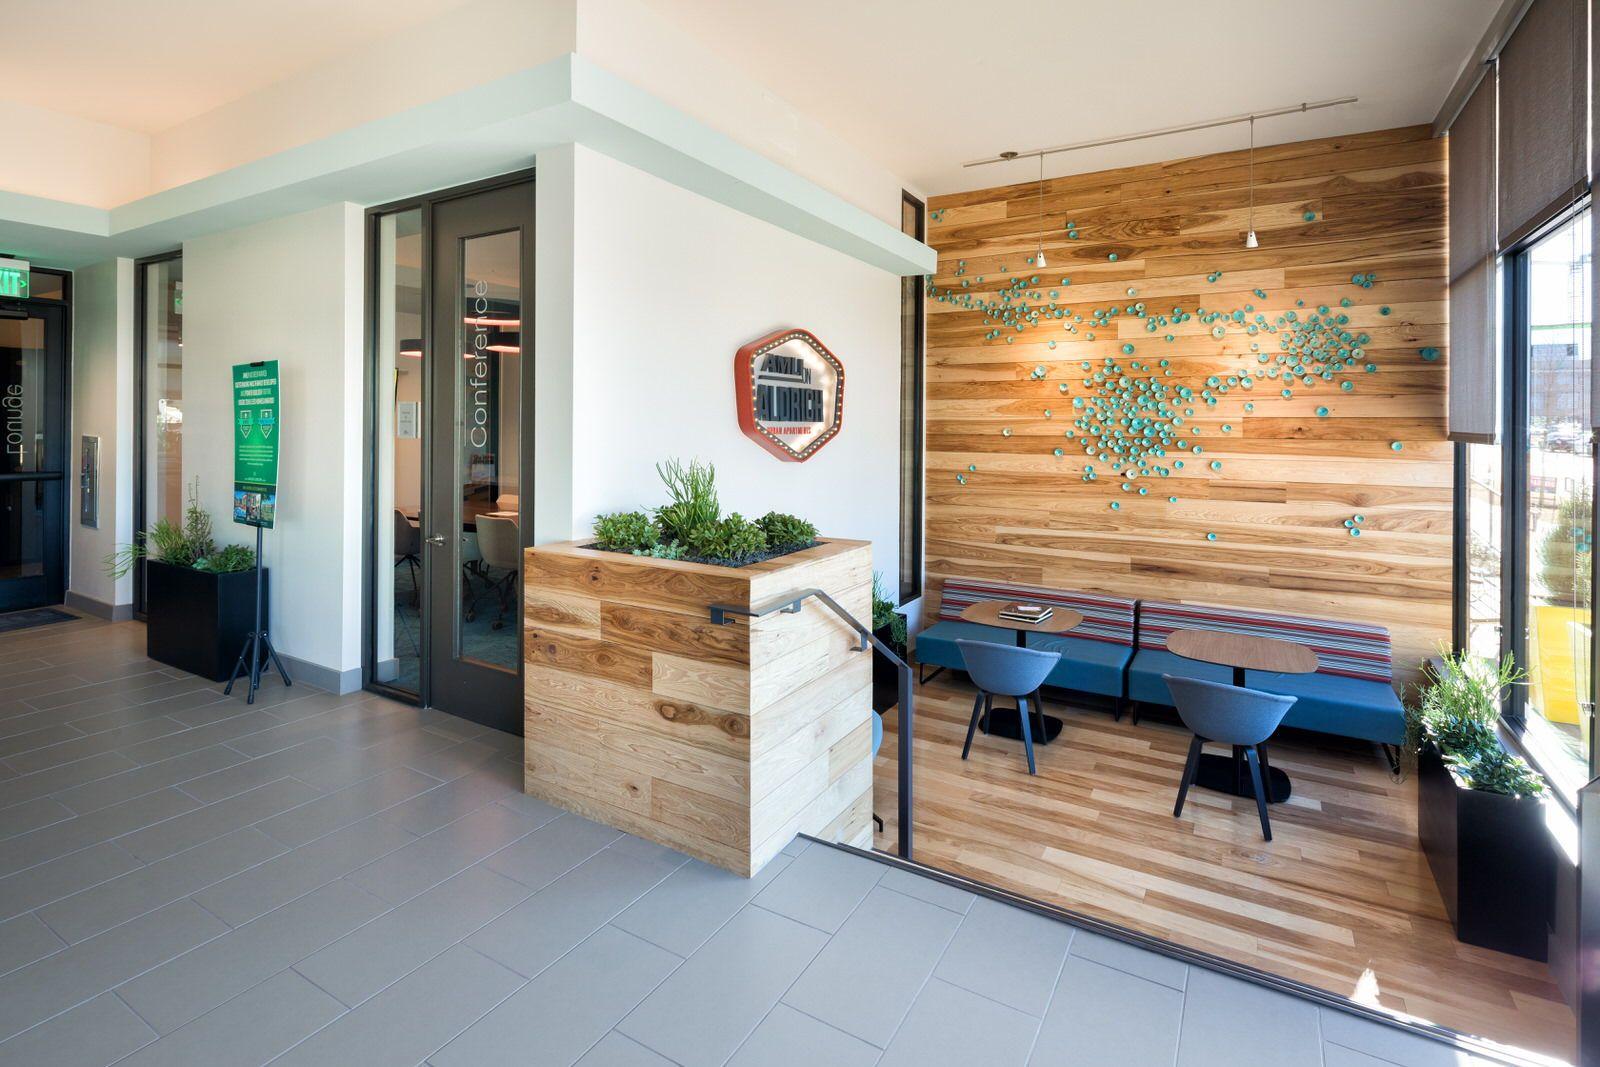 AMLI on Aldrich is an apartment community in Austin's